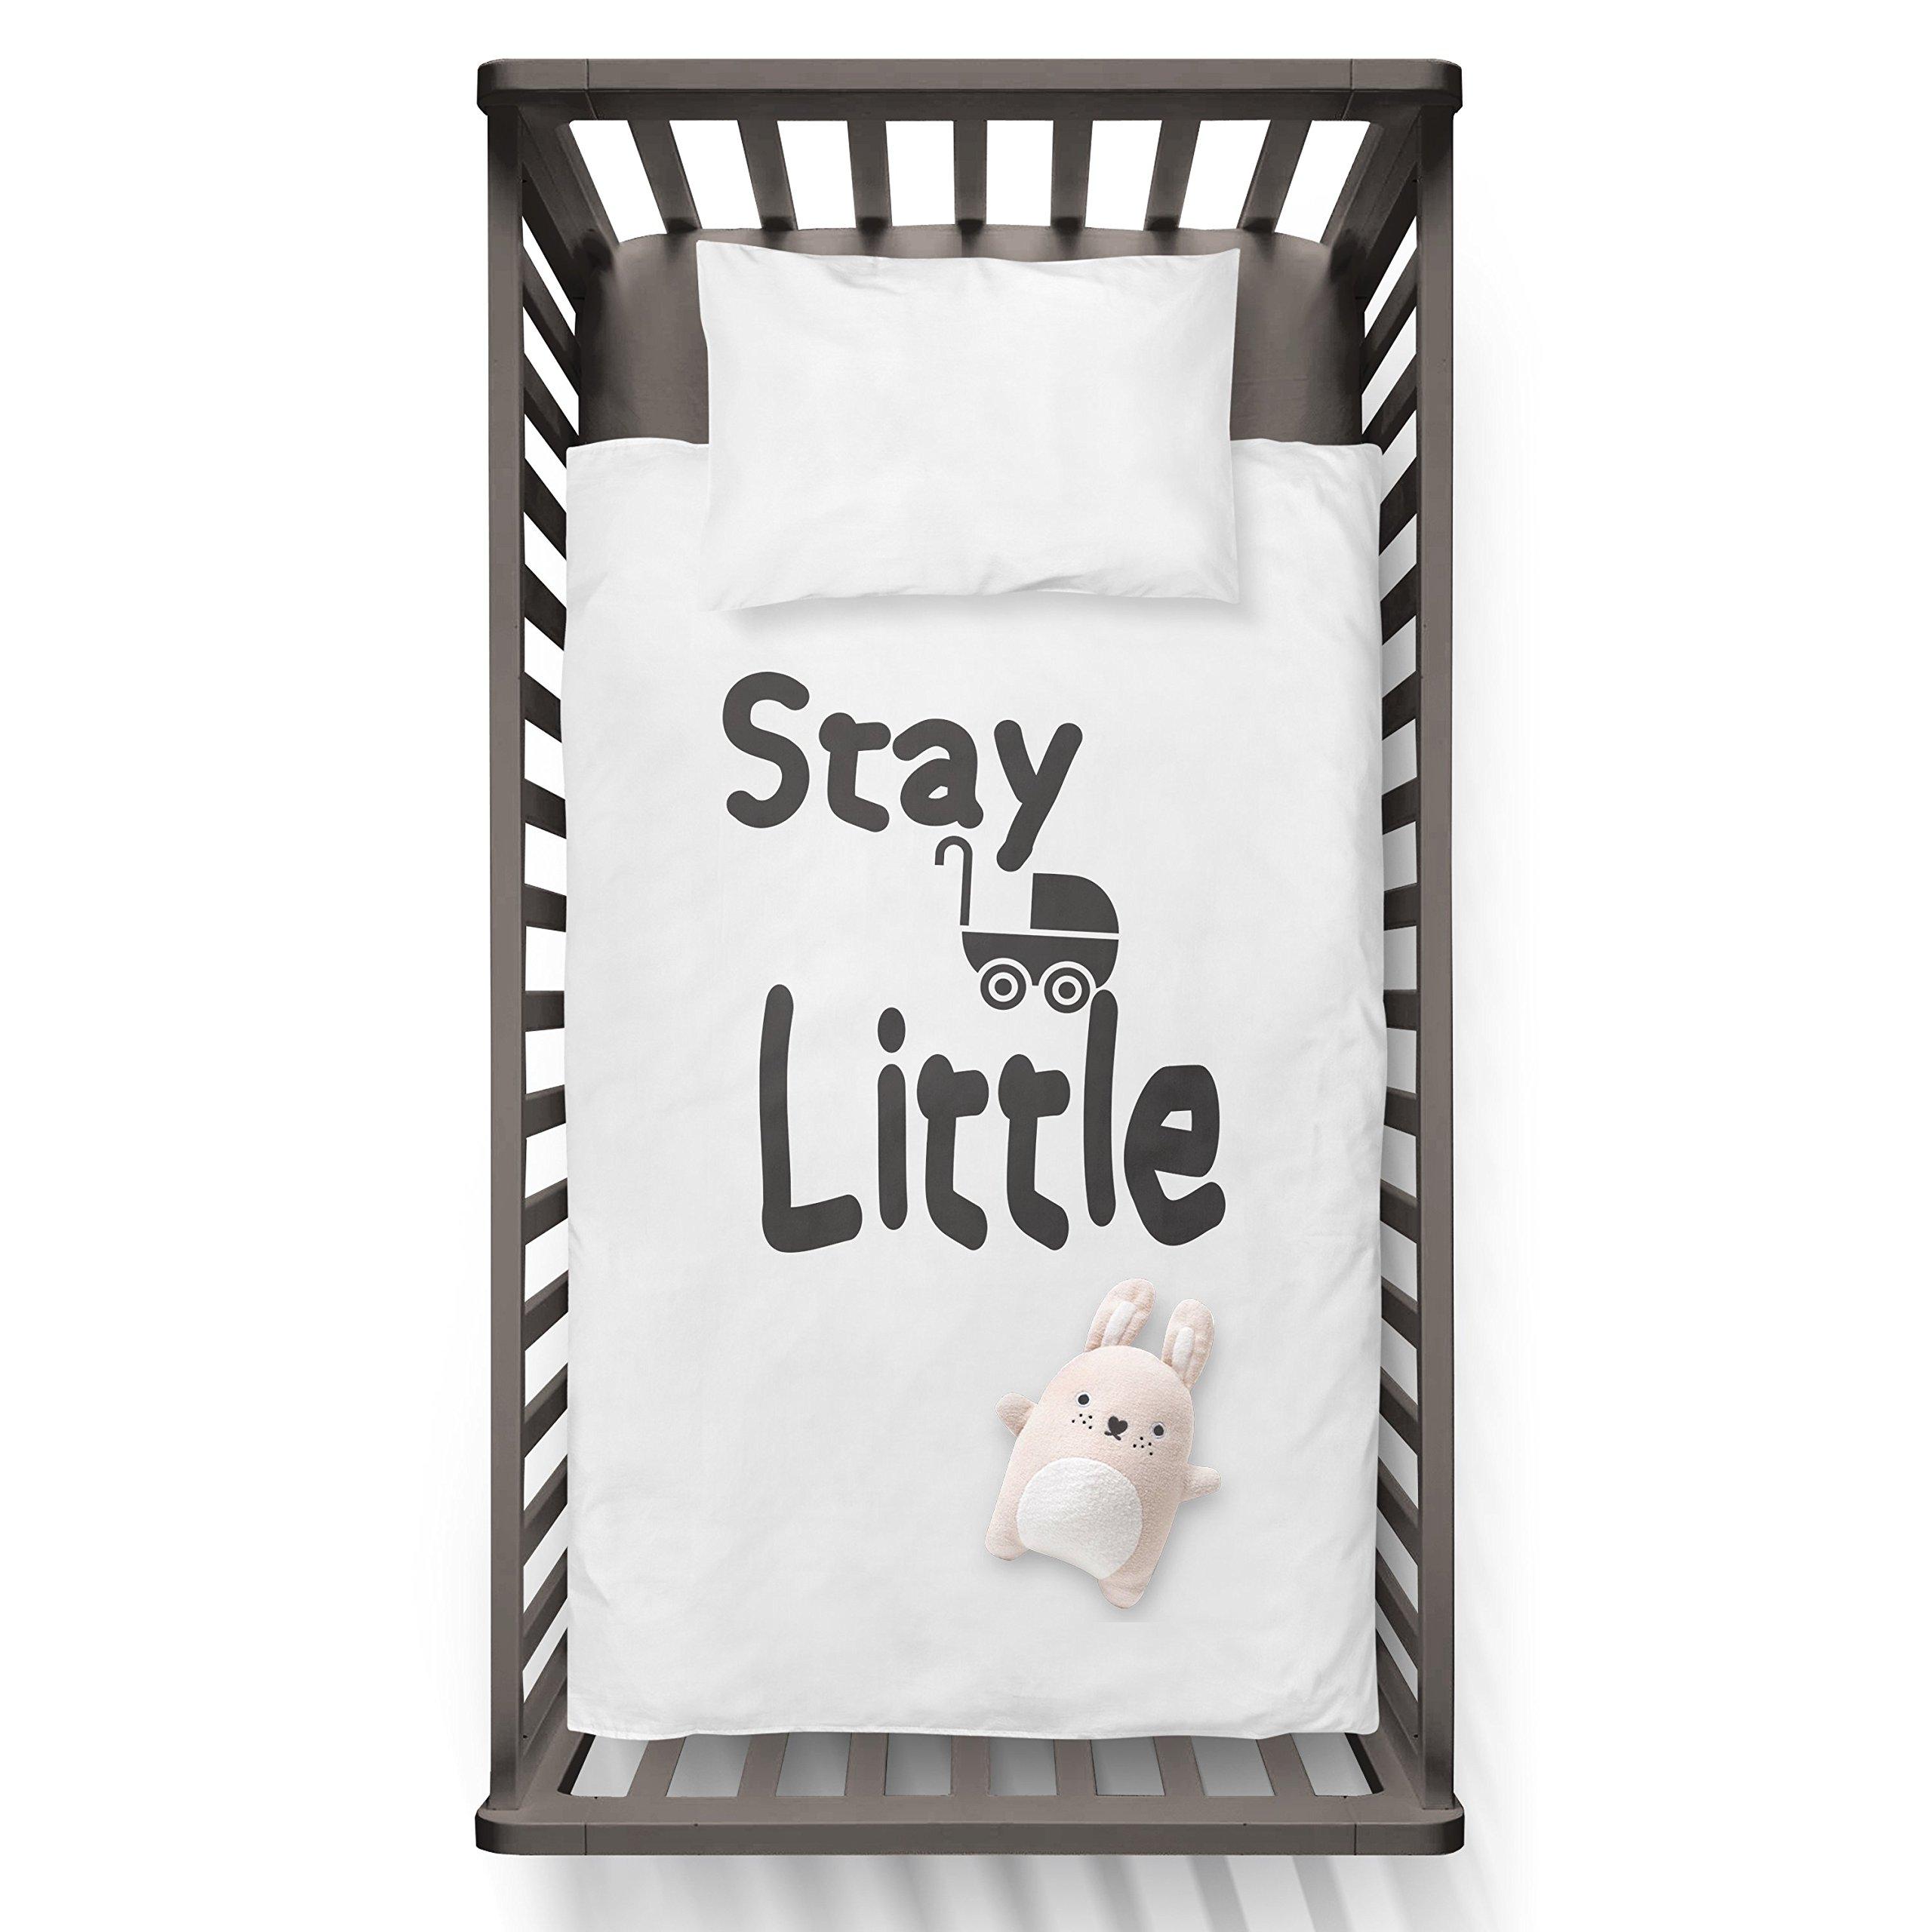 Stay Little Funny Humor Hip Baby Duvet /Pillow set,Toddler Duvet,Oeko-Tex,Personalized duvet and pillow,Oraganic,gift